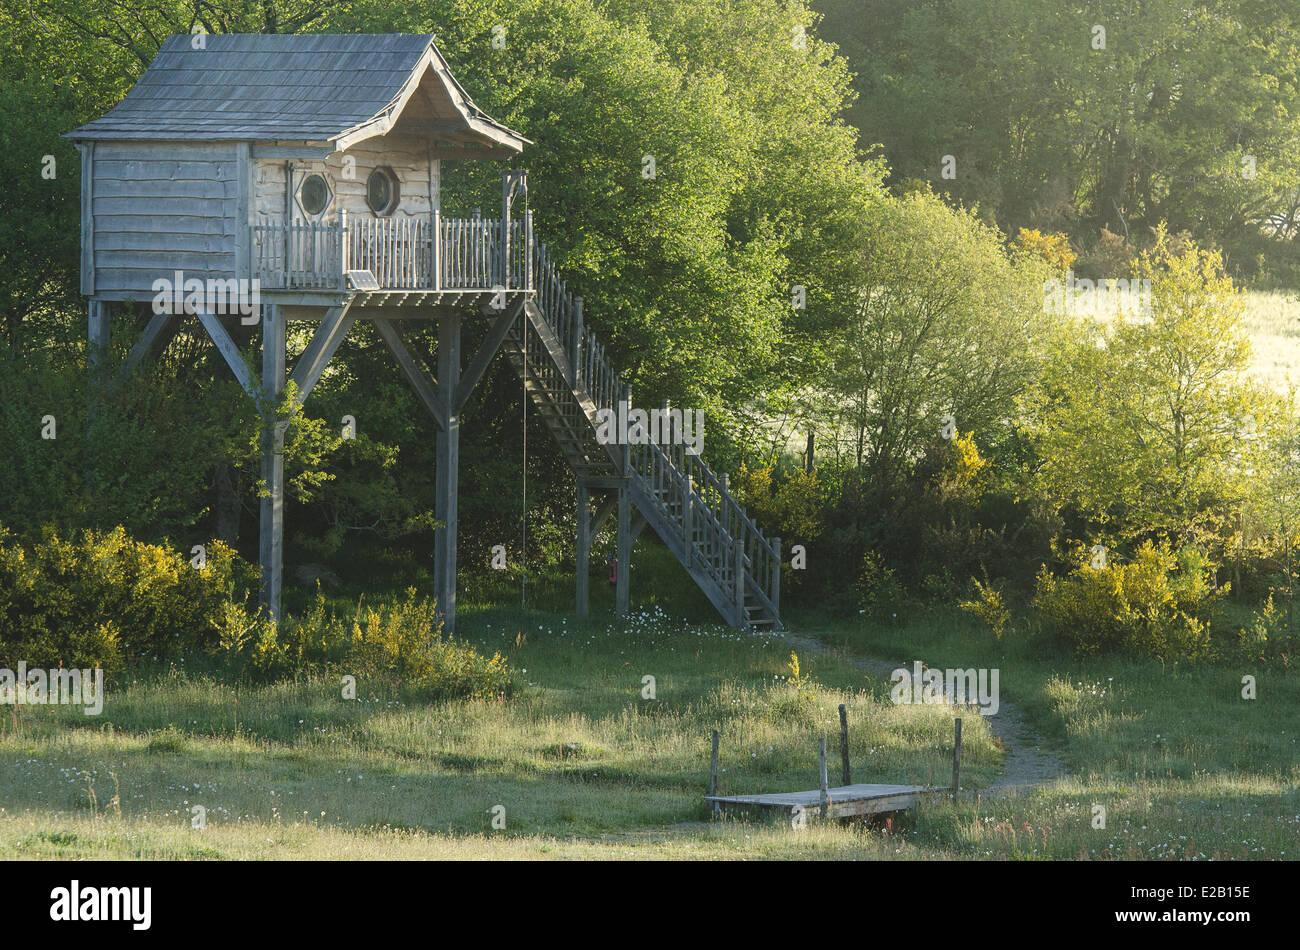 France, Morbihan, Moustoir Ac, tourist accomodation Les Cabanes de Bretagne (The Treehouses of Brittany) - Stock Image